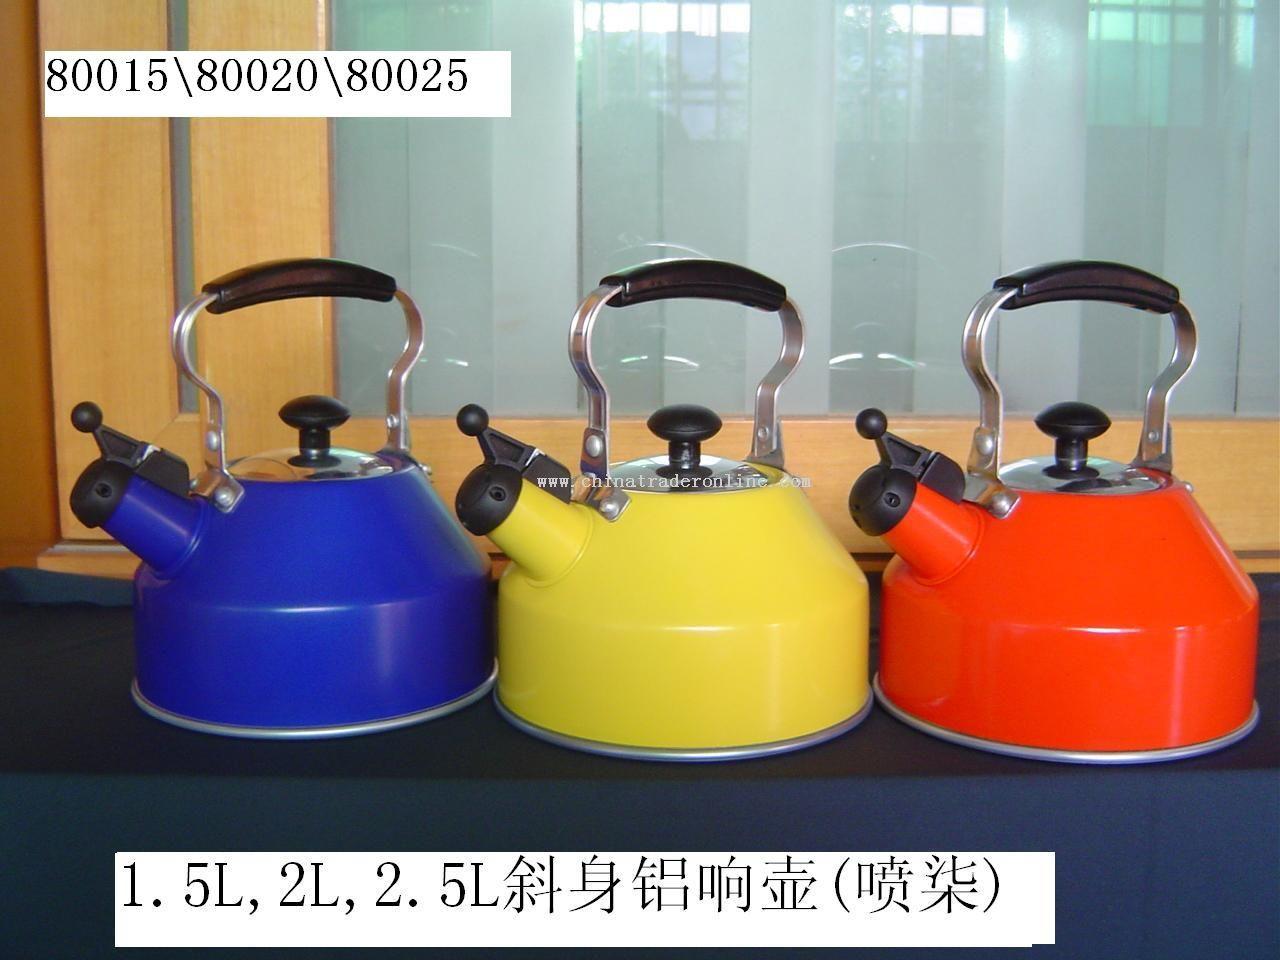 Aluminium kettle